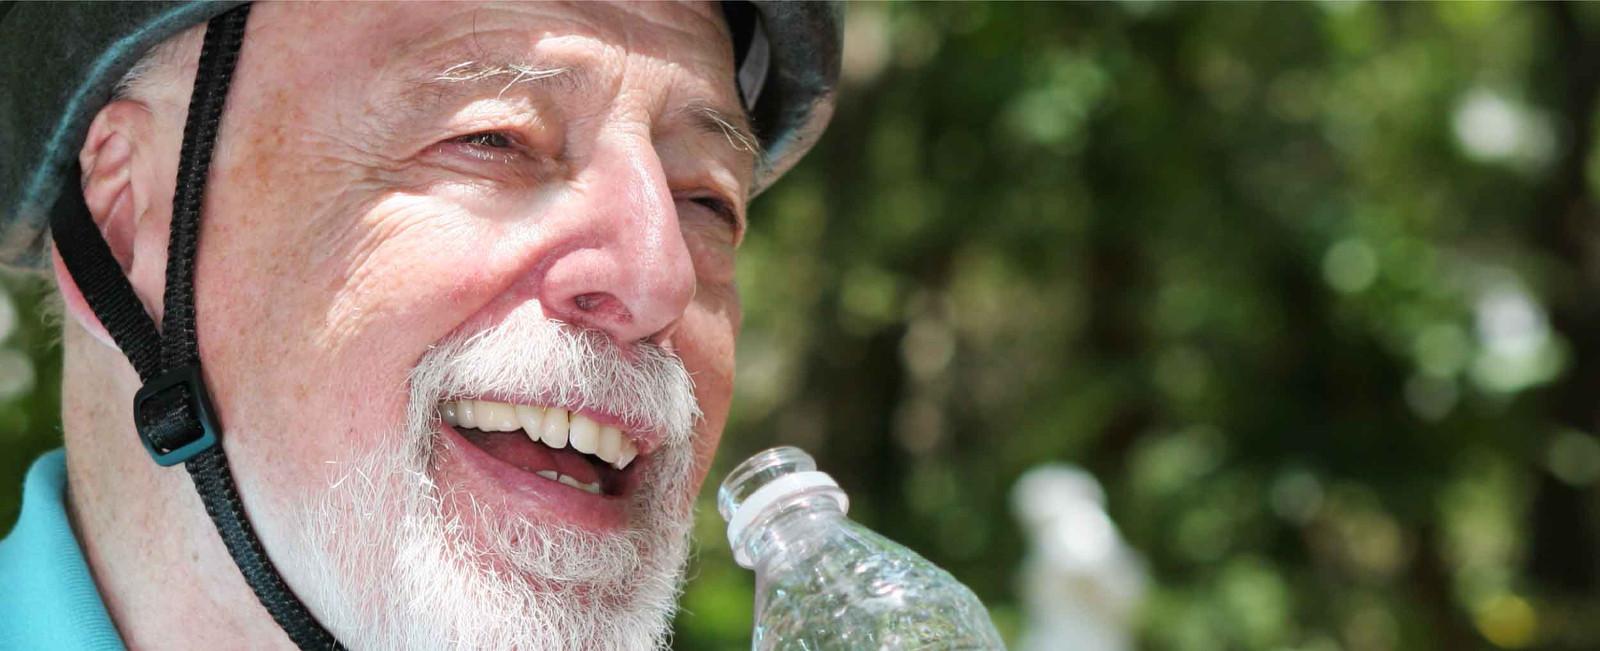 Hidratación en la tercera edad   Agua MIneral Natural